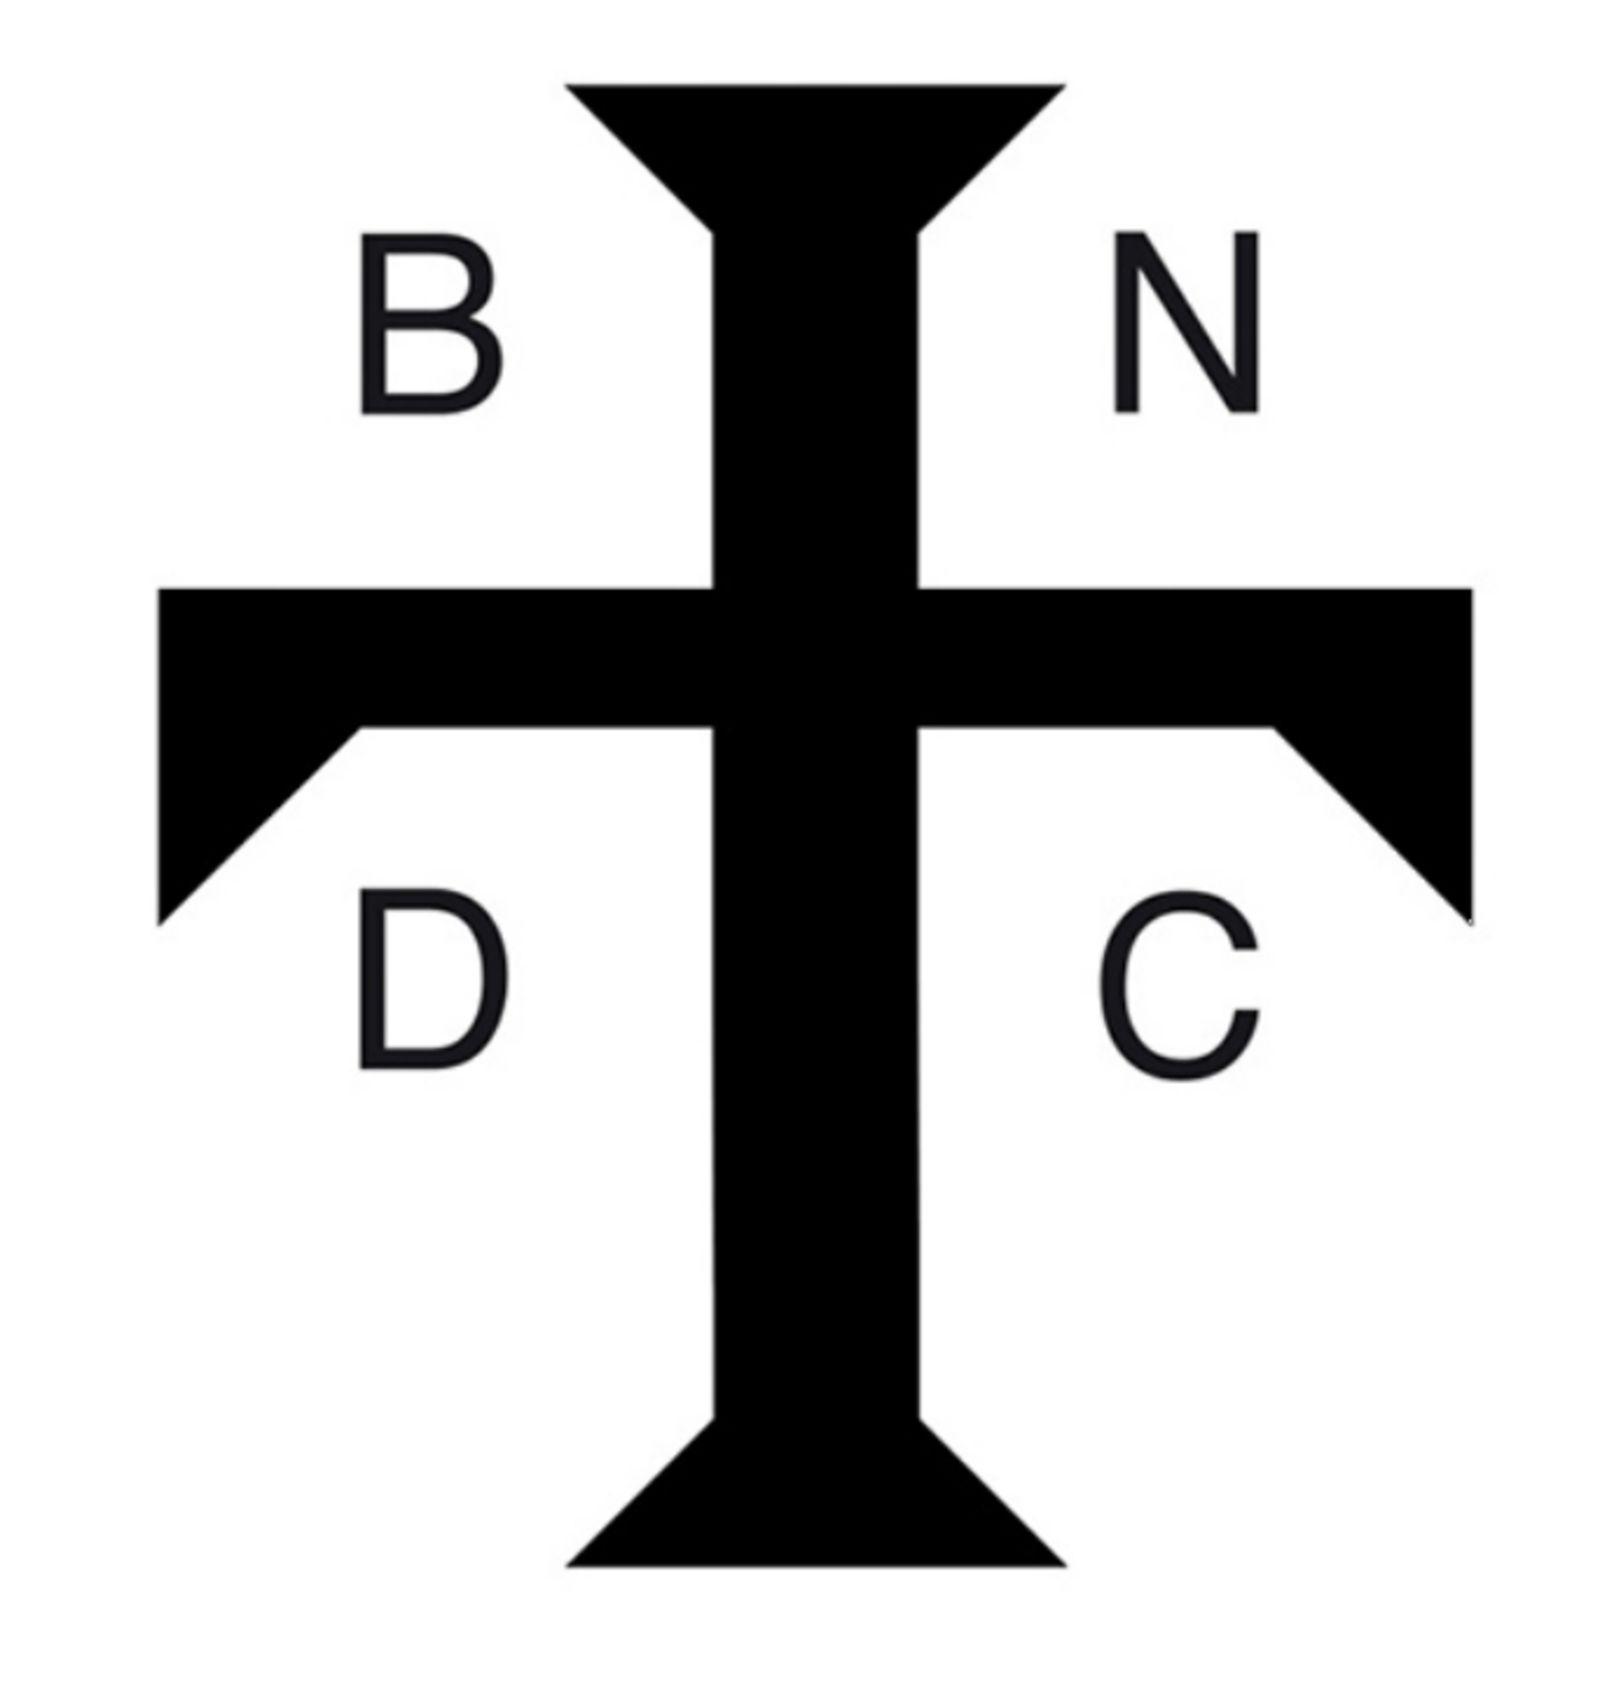 Benedict (Image 1)